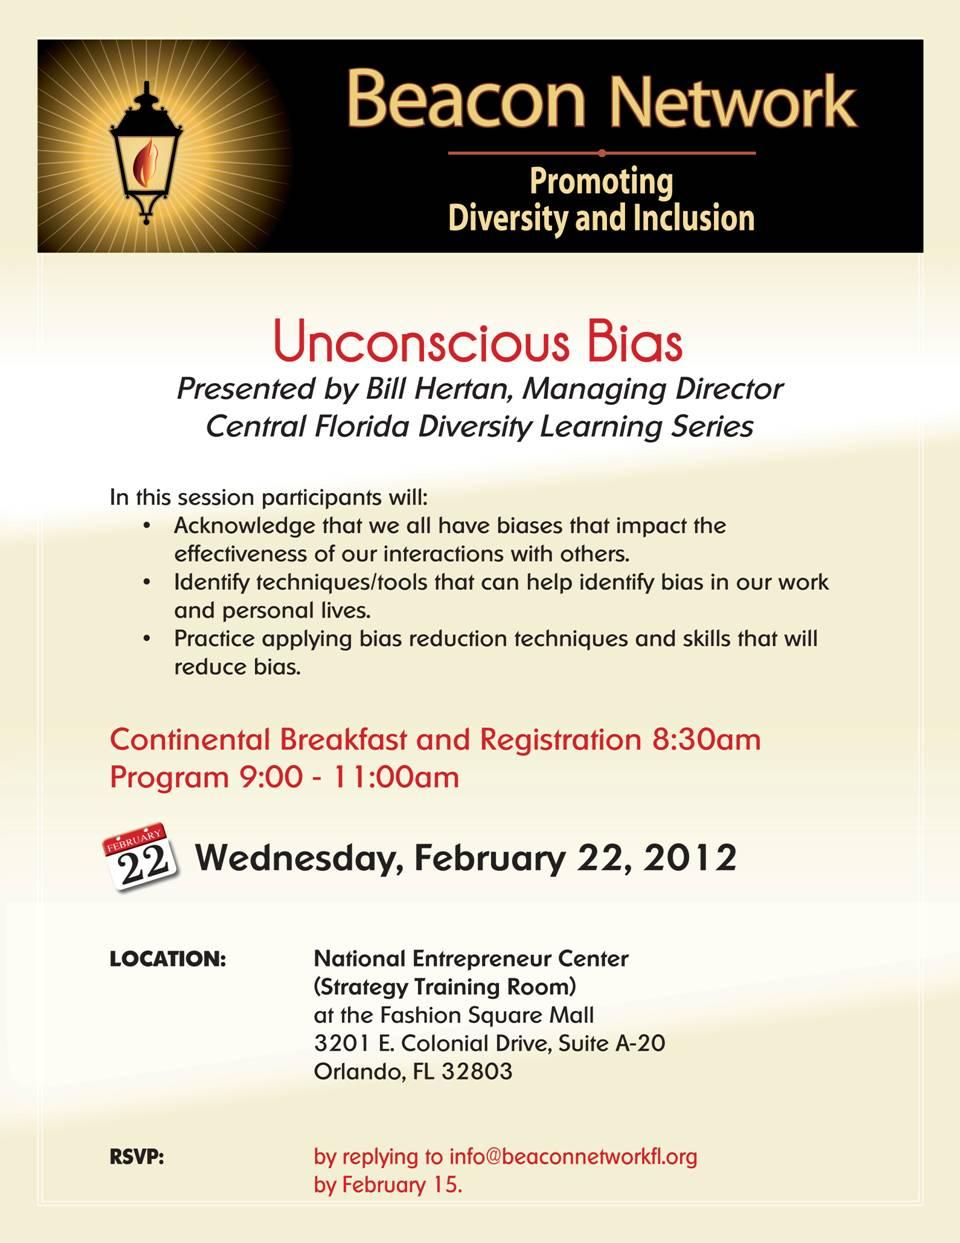 Beacon Network February 2012 Forum Flyet